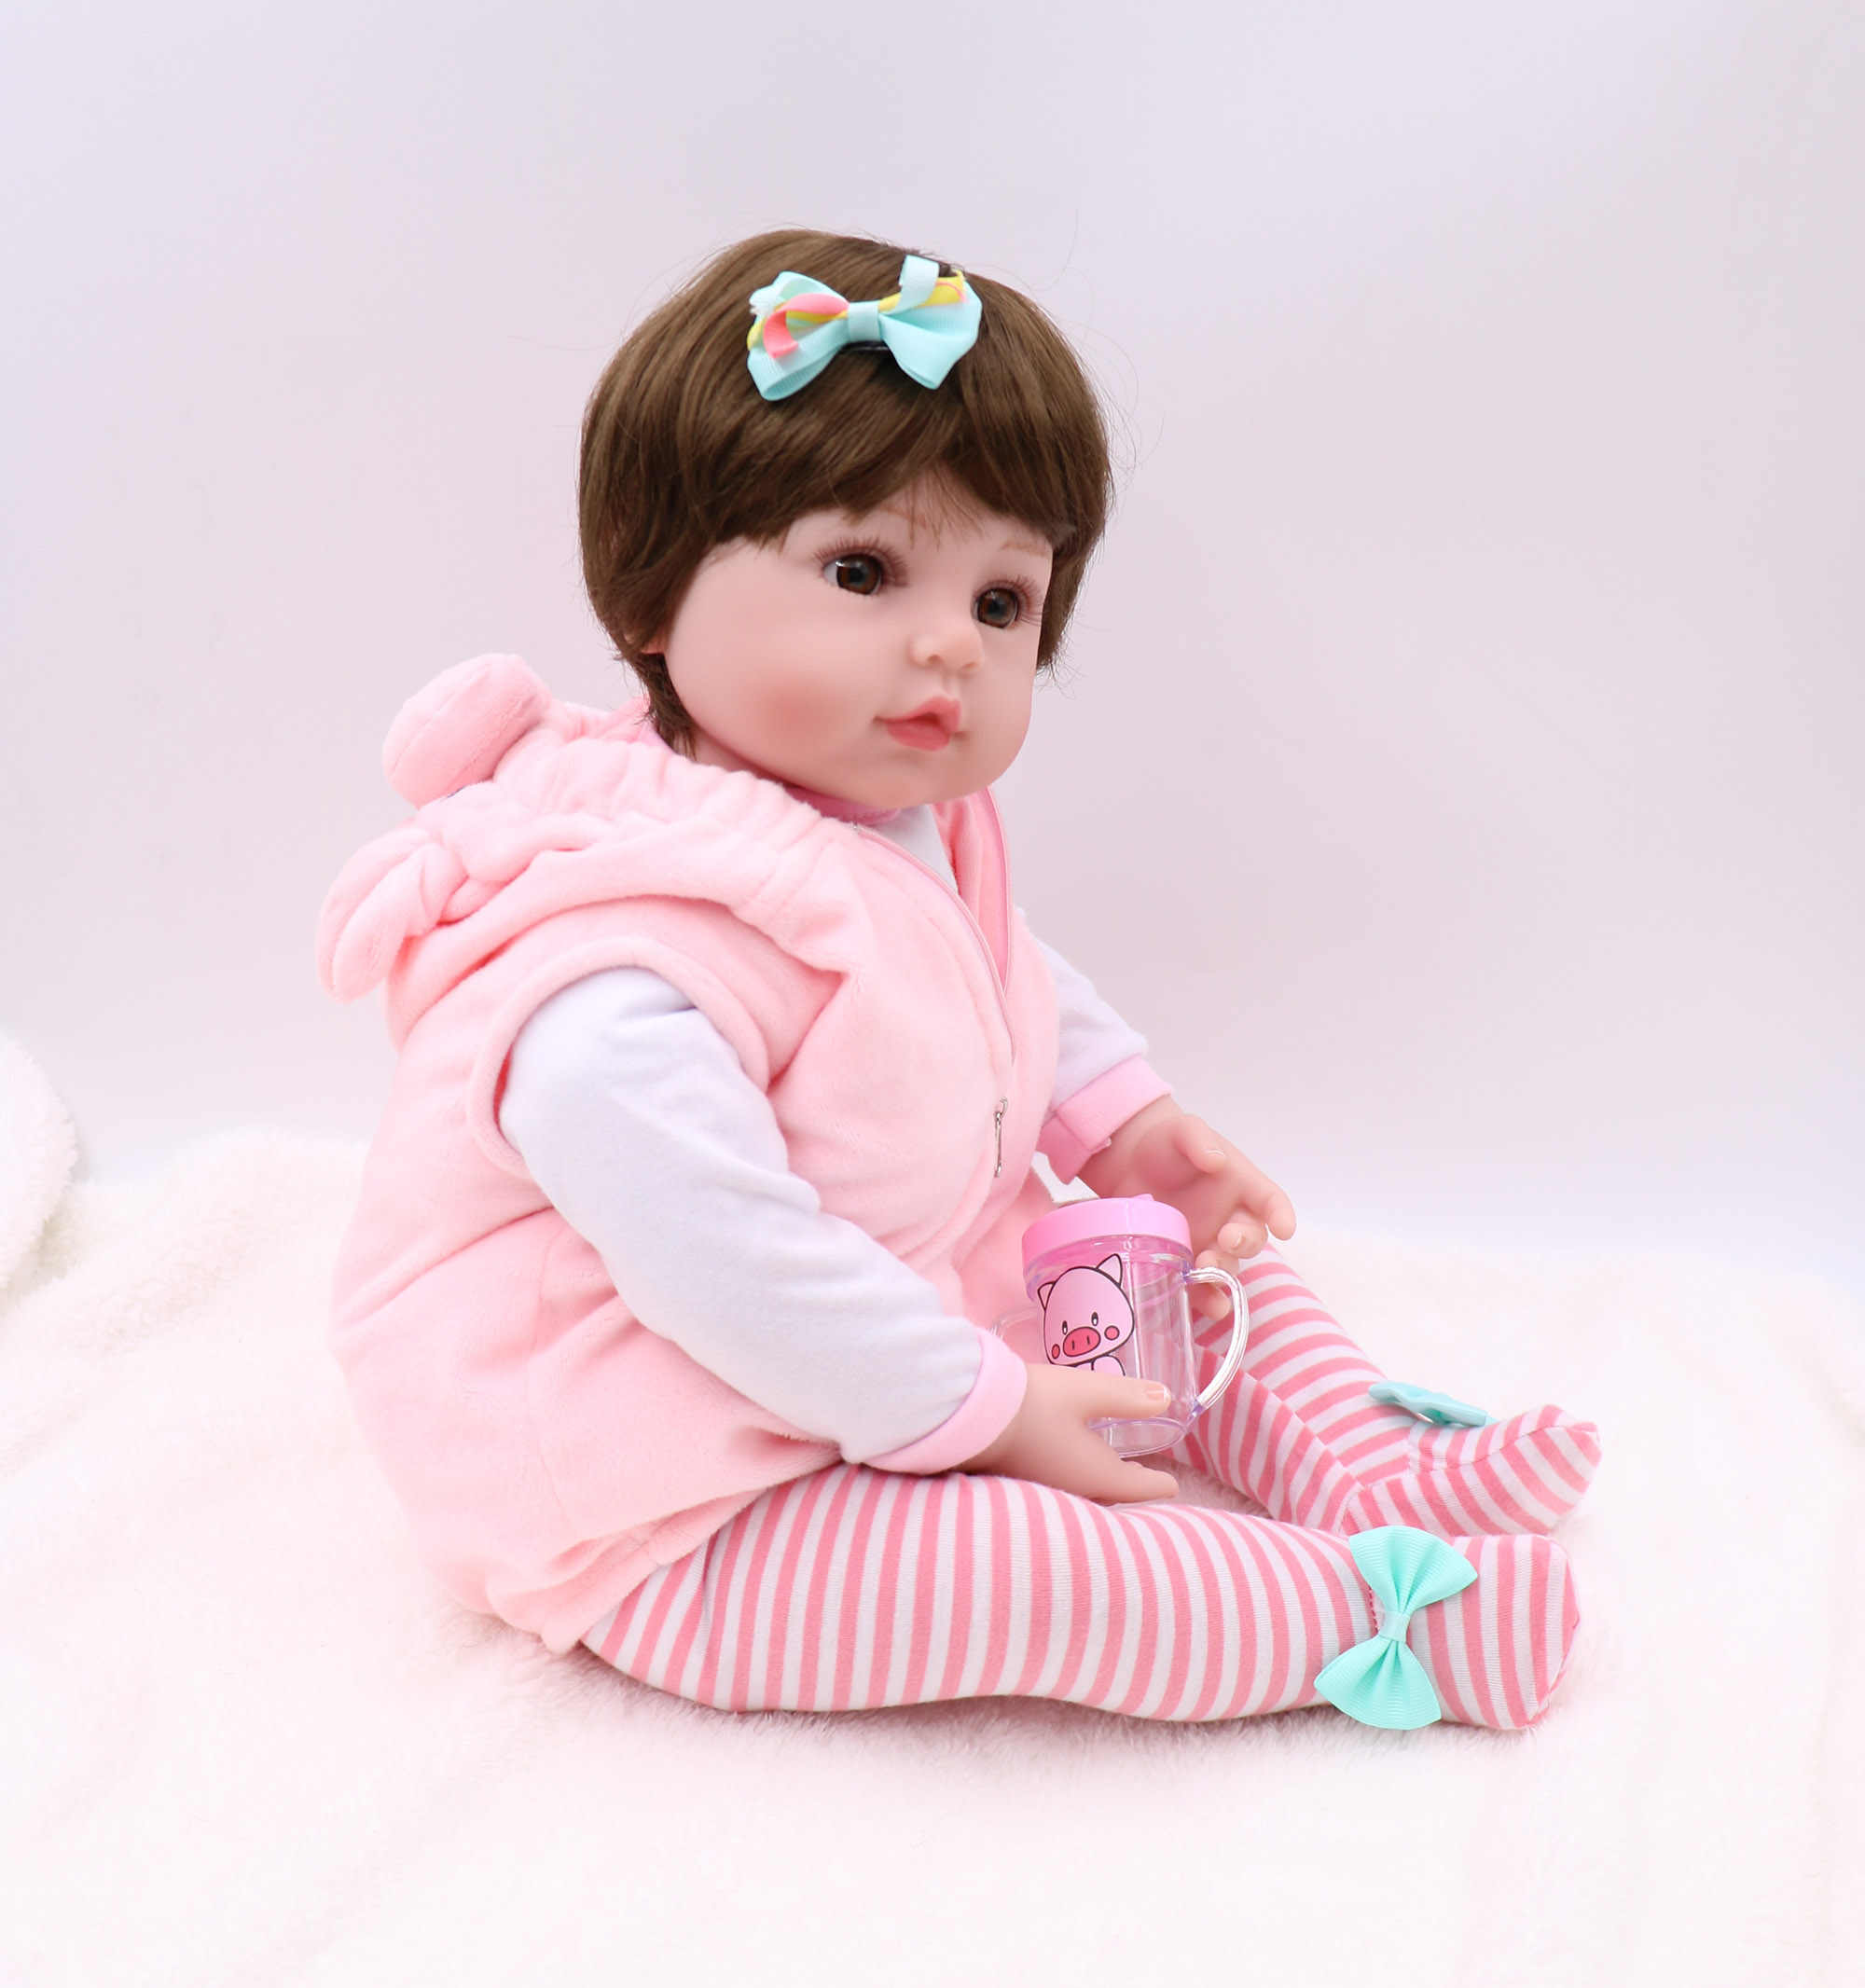 47cm Reborn toddler bebe doll reborn baby girl soft silicone vinyl stuffed body Christmas surprise gifts lol doll